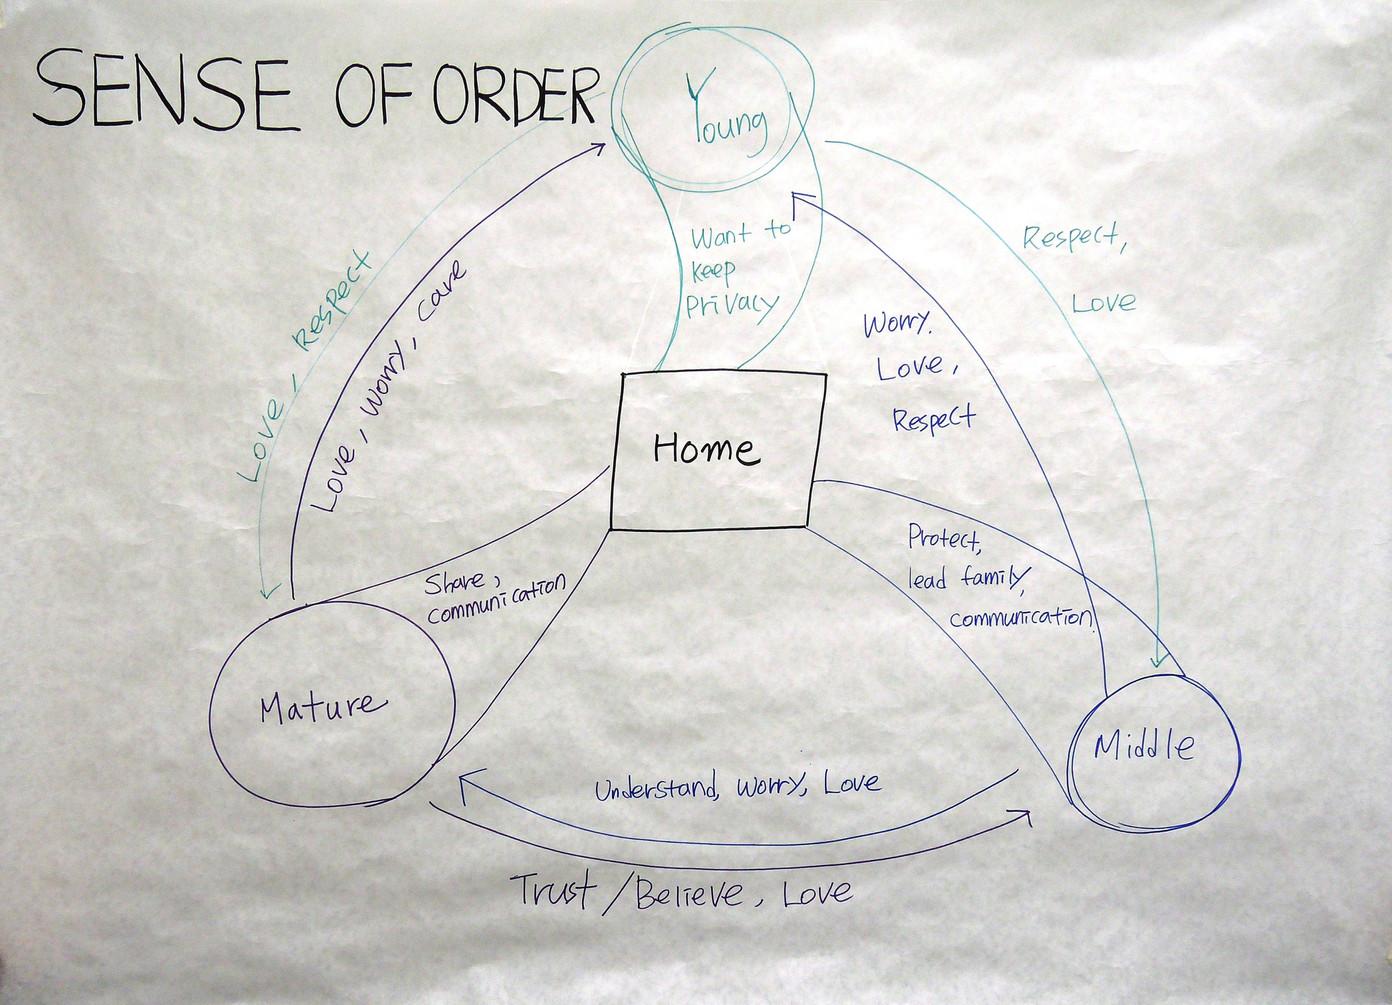 3.3. Sense of order